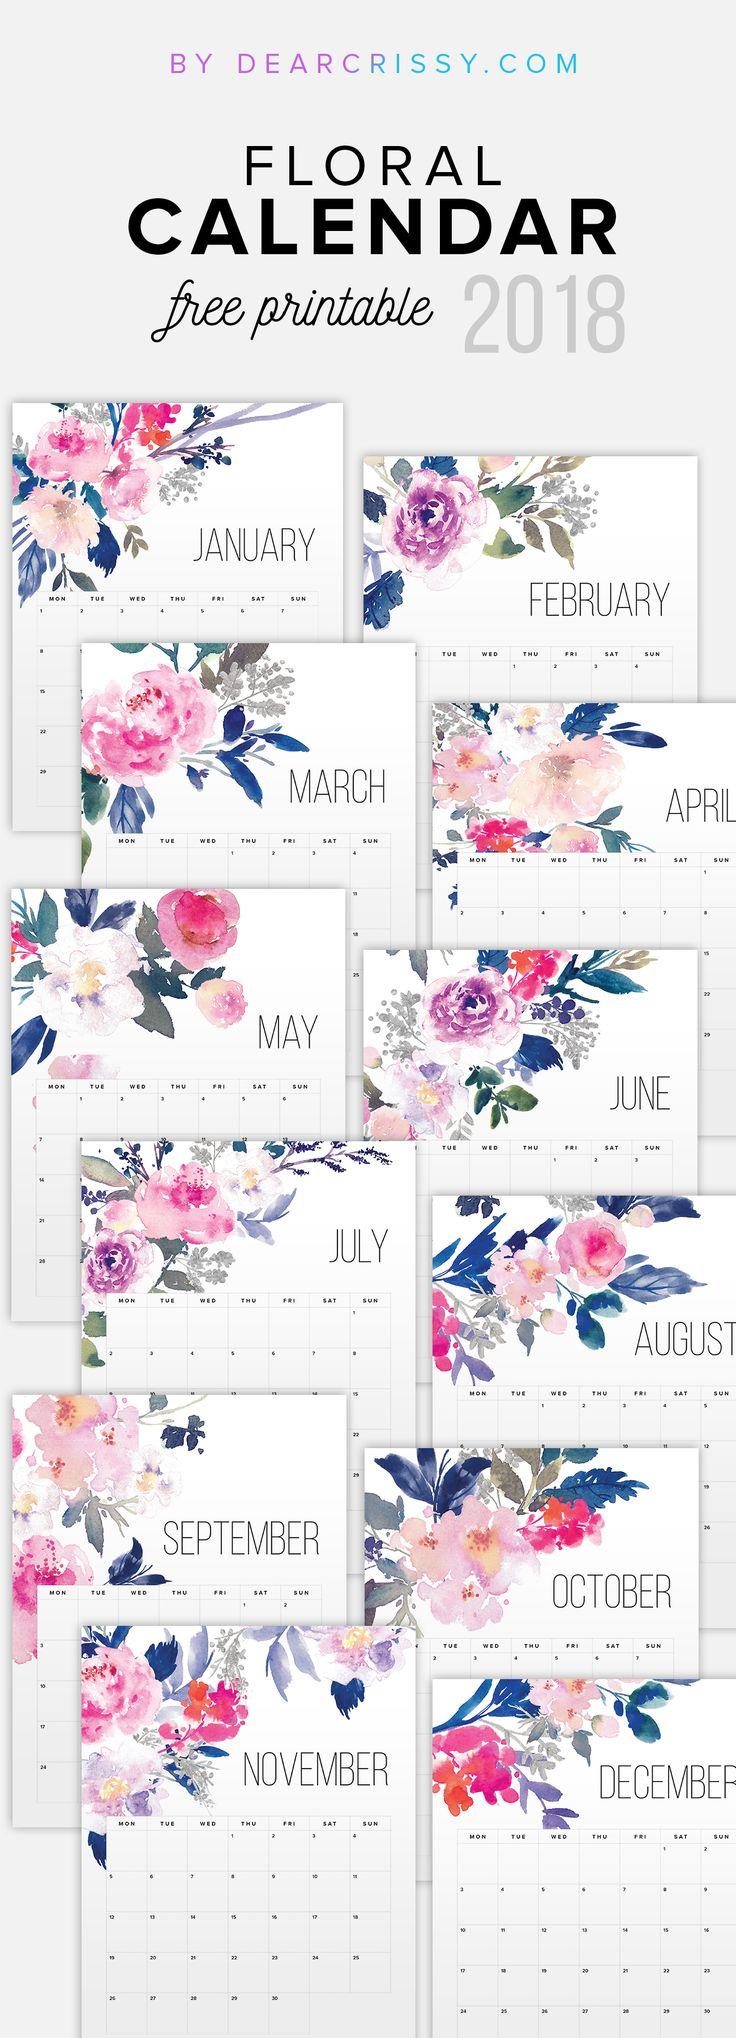 Free Printable Floral Calendar 2018 #Calendar #FreePrintable #PrintableCalendar #2018